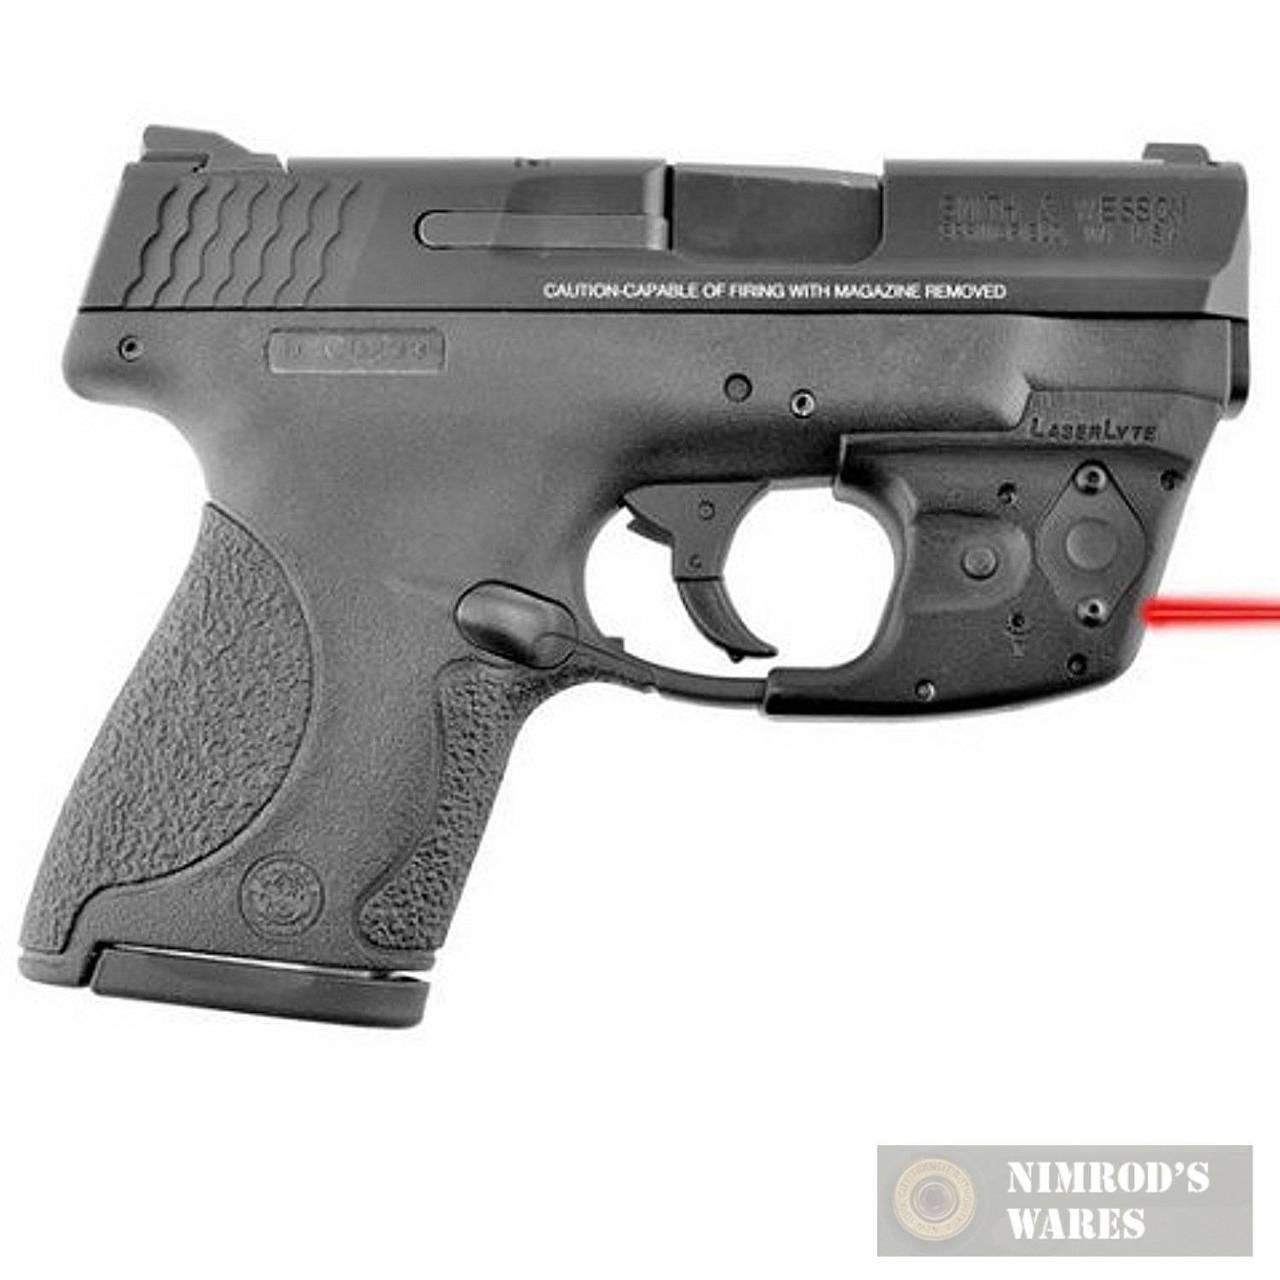 LASERLYTE® UTA-SH Trigger Guard LASER S&W Shield 9mm/40S&W